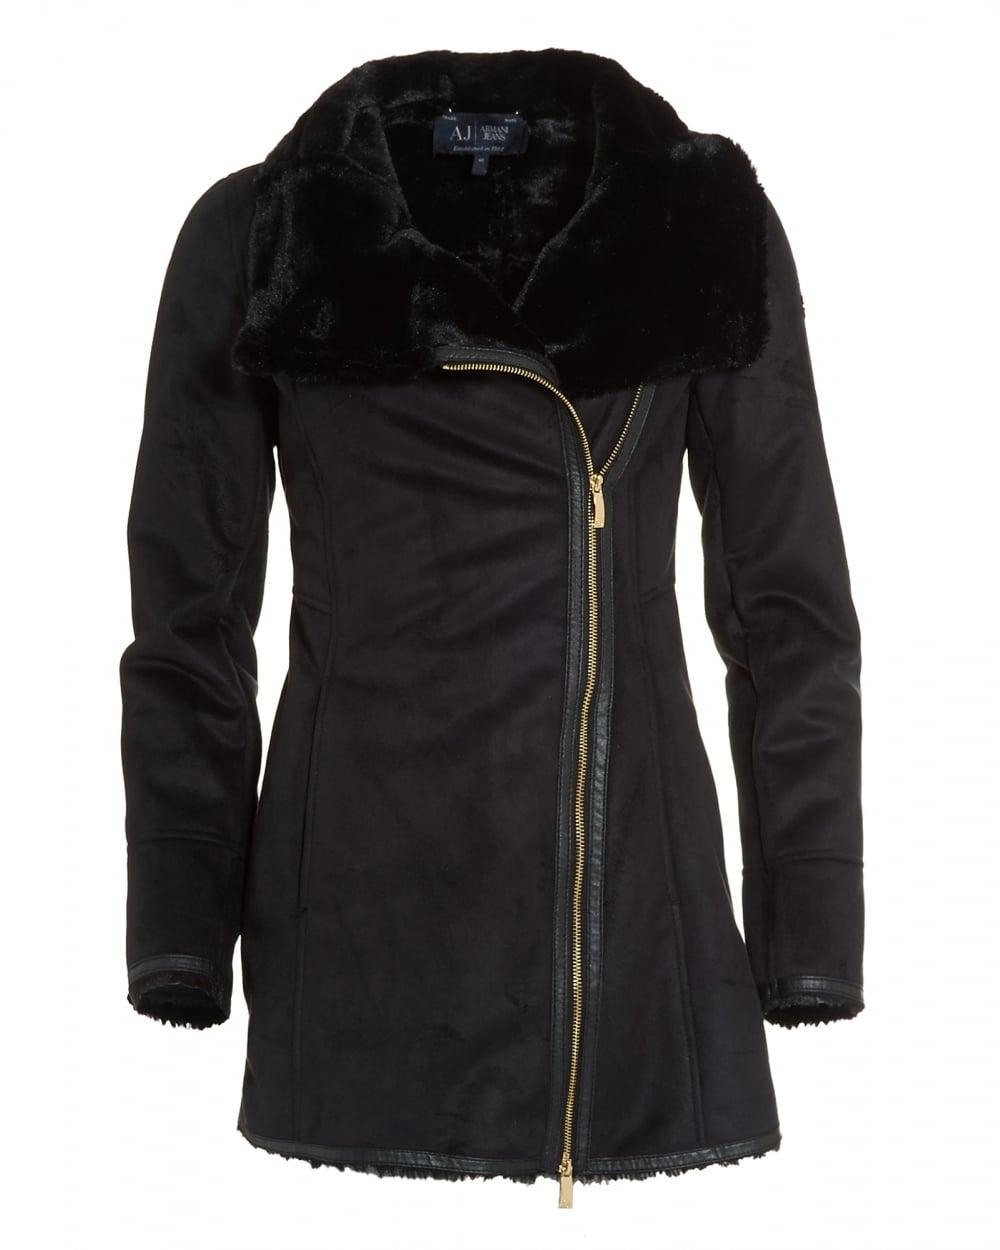 Armani Jeans Womens Faux Shearling Black Coat